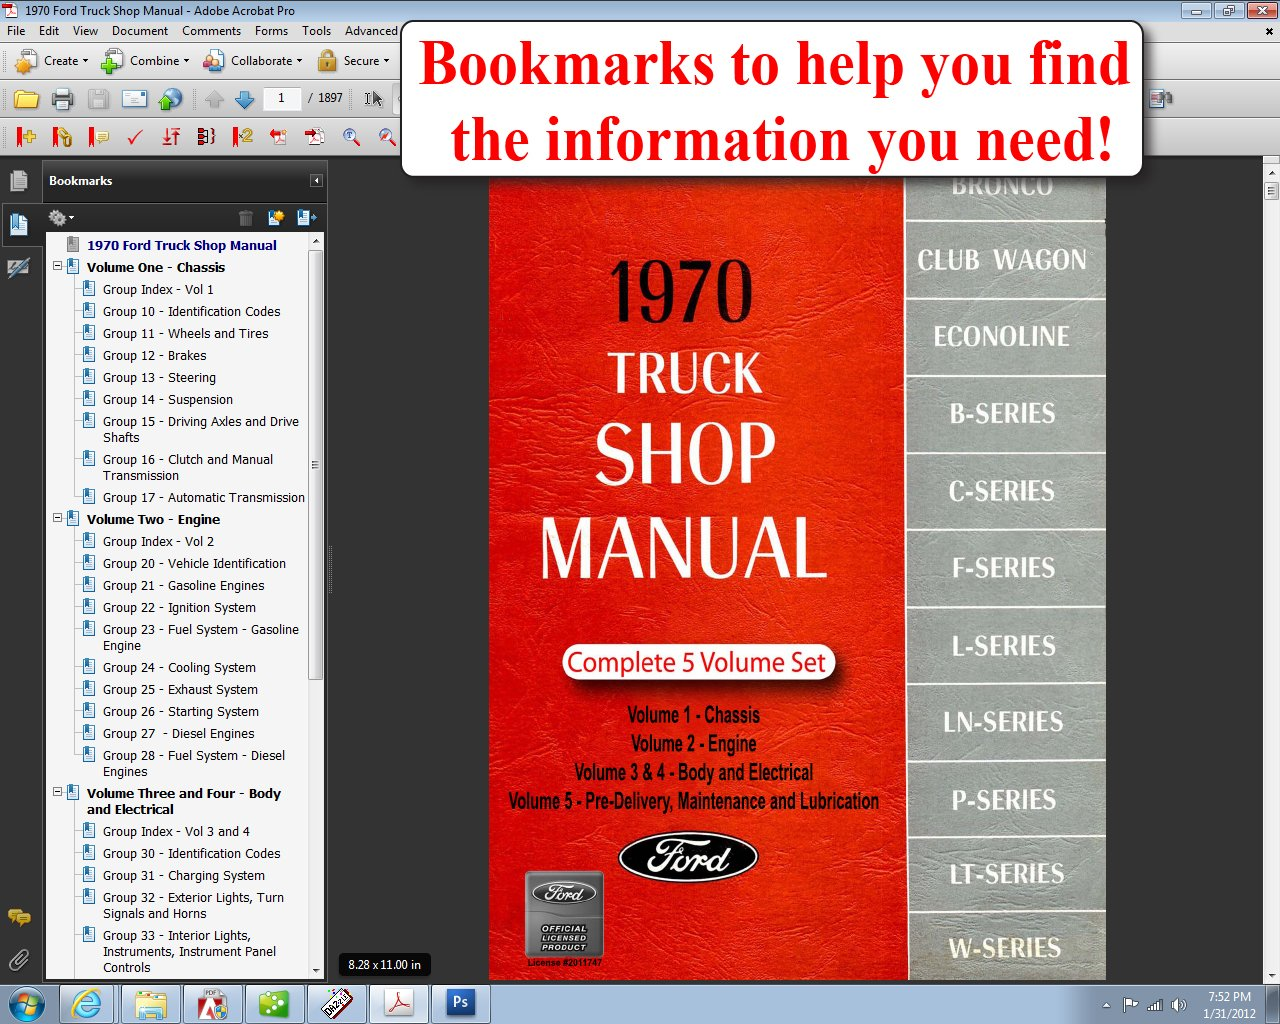 1970 Ford Truck Shop Manual: Ford Motor Company, David E. LeBlanc:  9781603710787: Amazon.com: Books